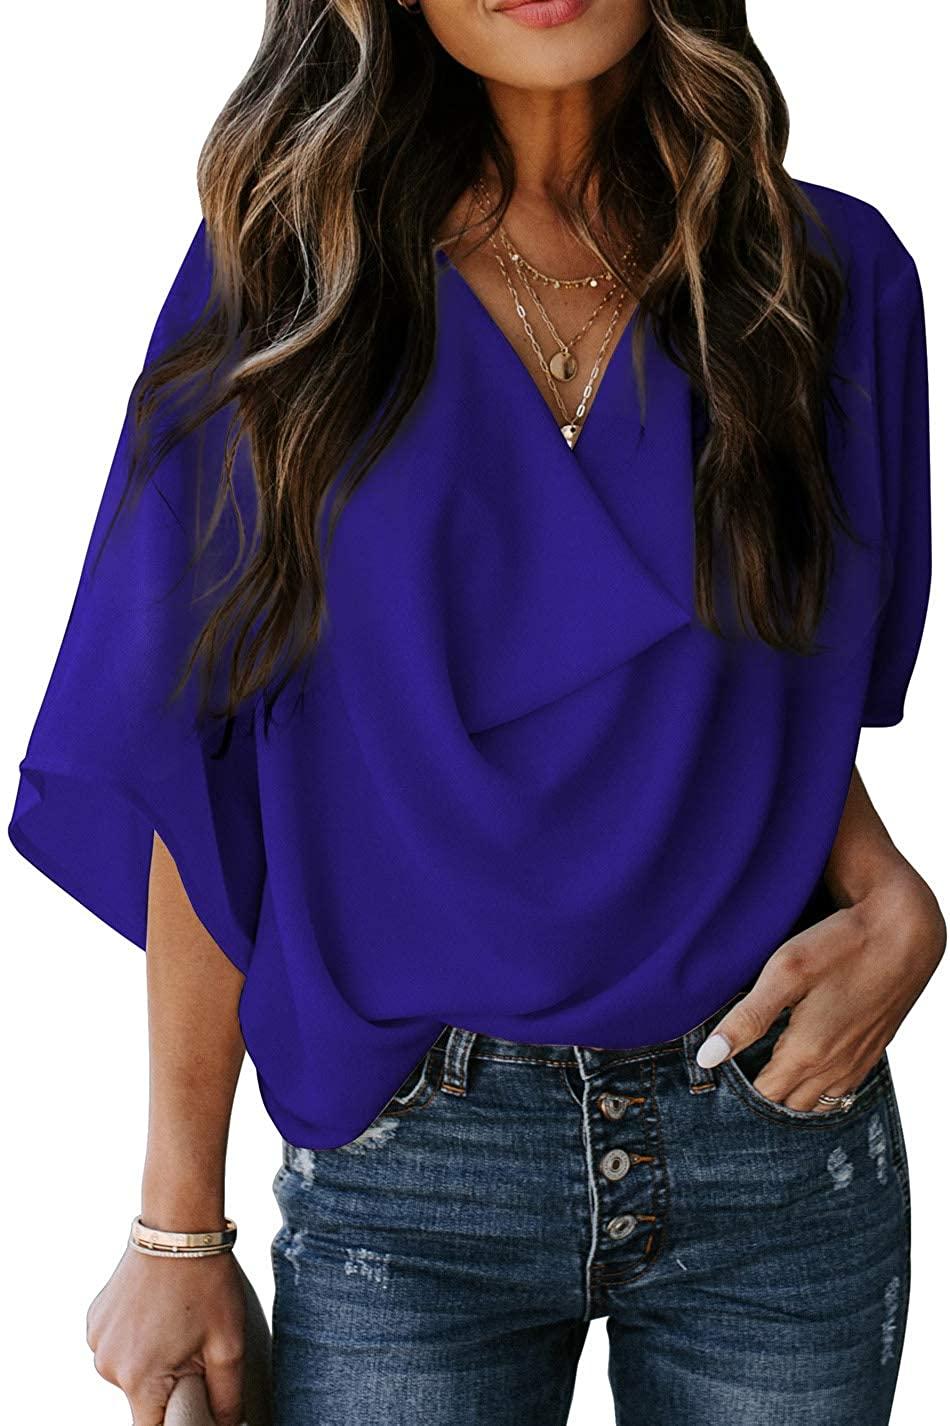 CILKOO Womens V Neck Wrap Drape Tops Casual Loose Half Bell Sleeve Shirts Chiffon Blouses(S-XXL)